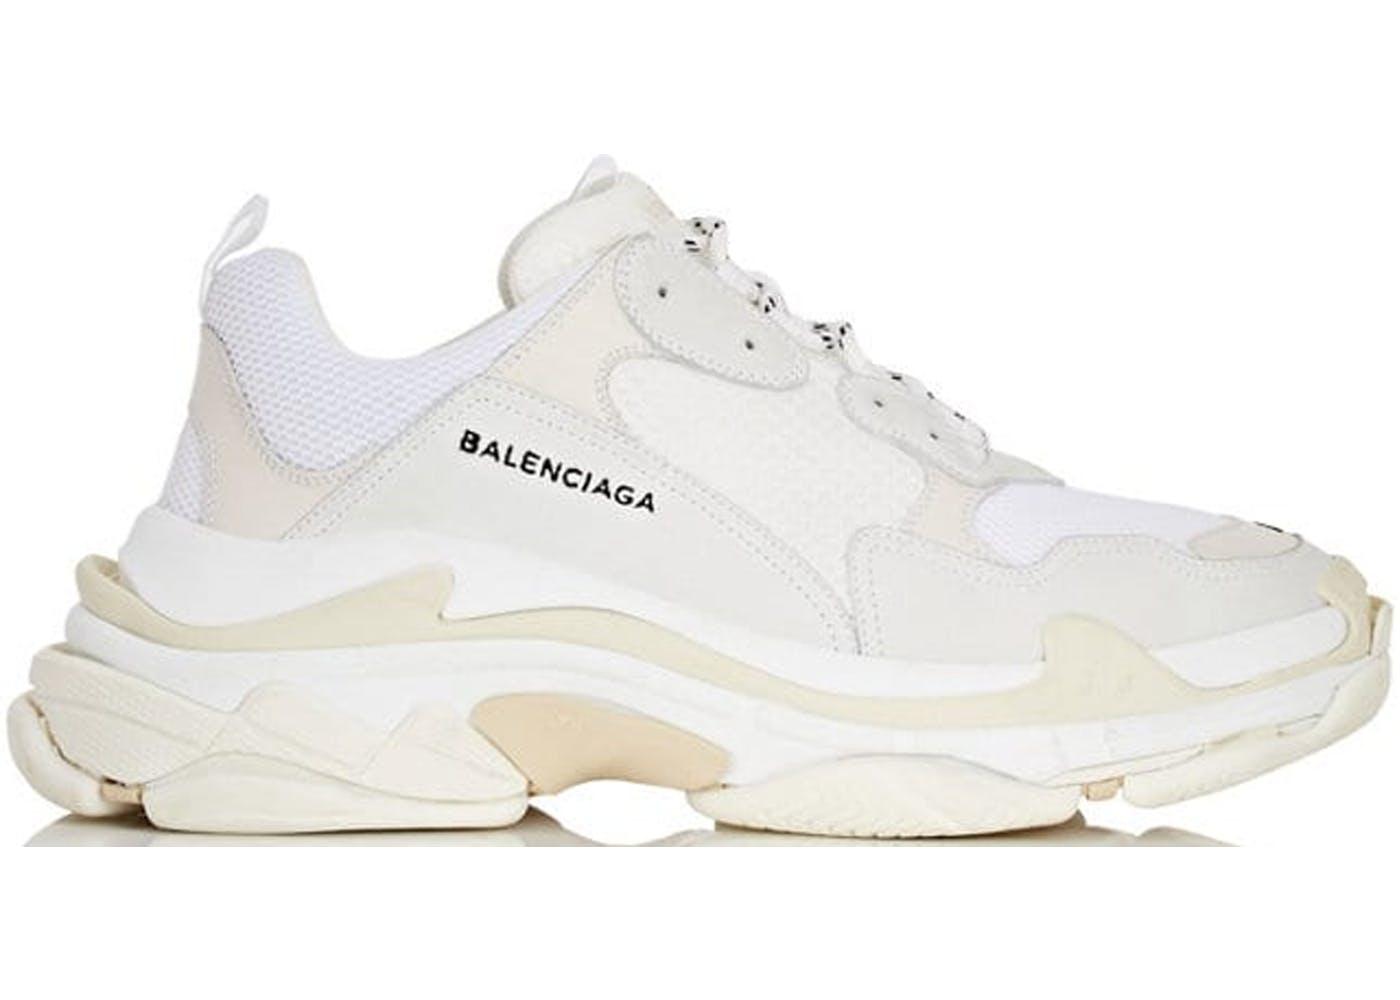 Balenciaga Triple S White(バレンシアガトリプルソールホワイト) ホワイト/ホワイト